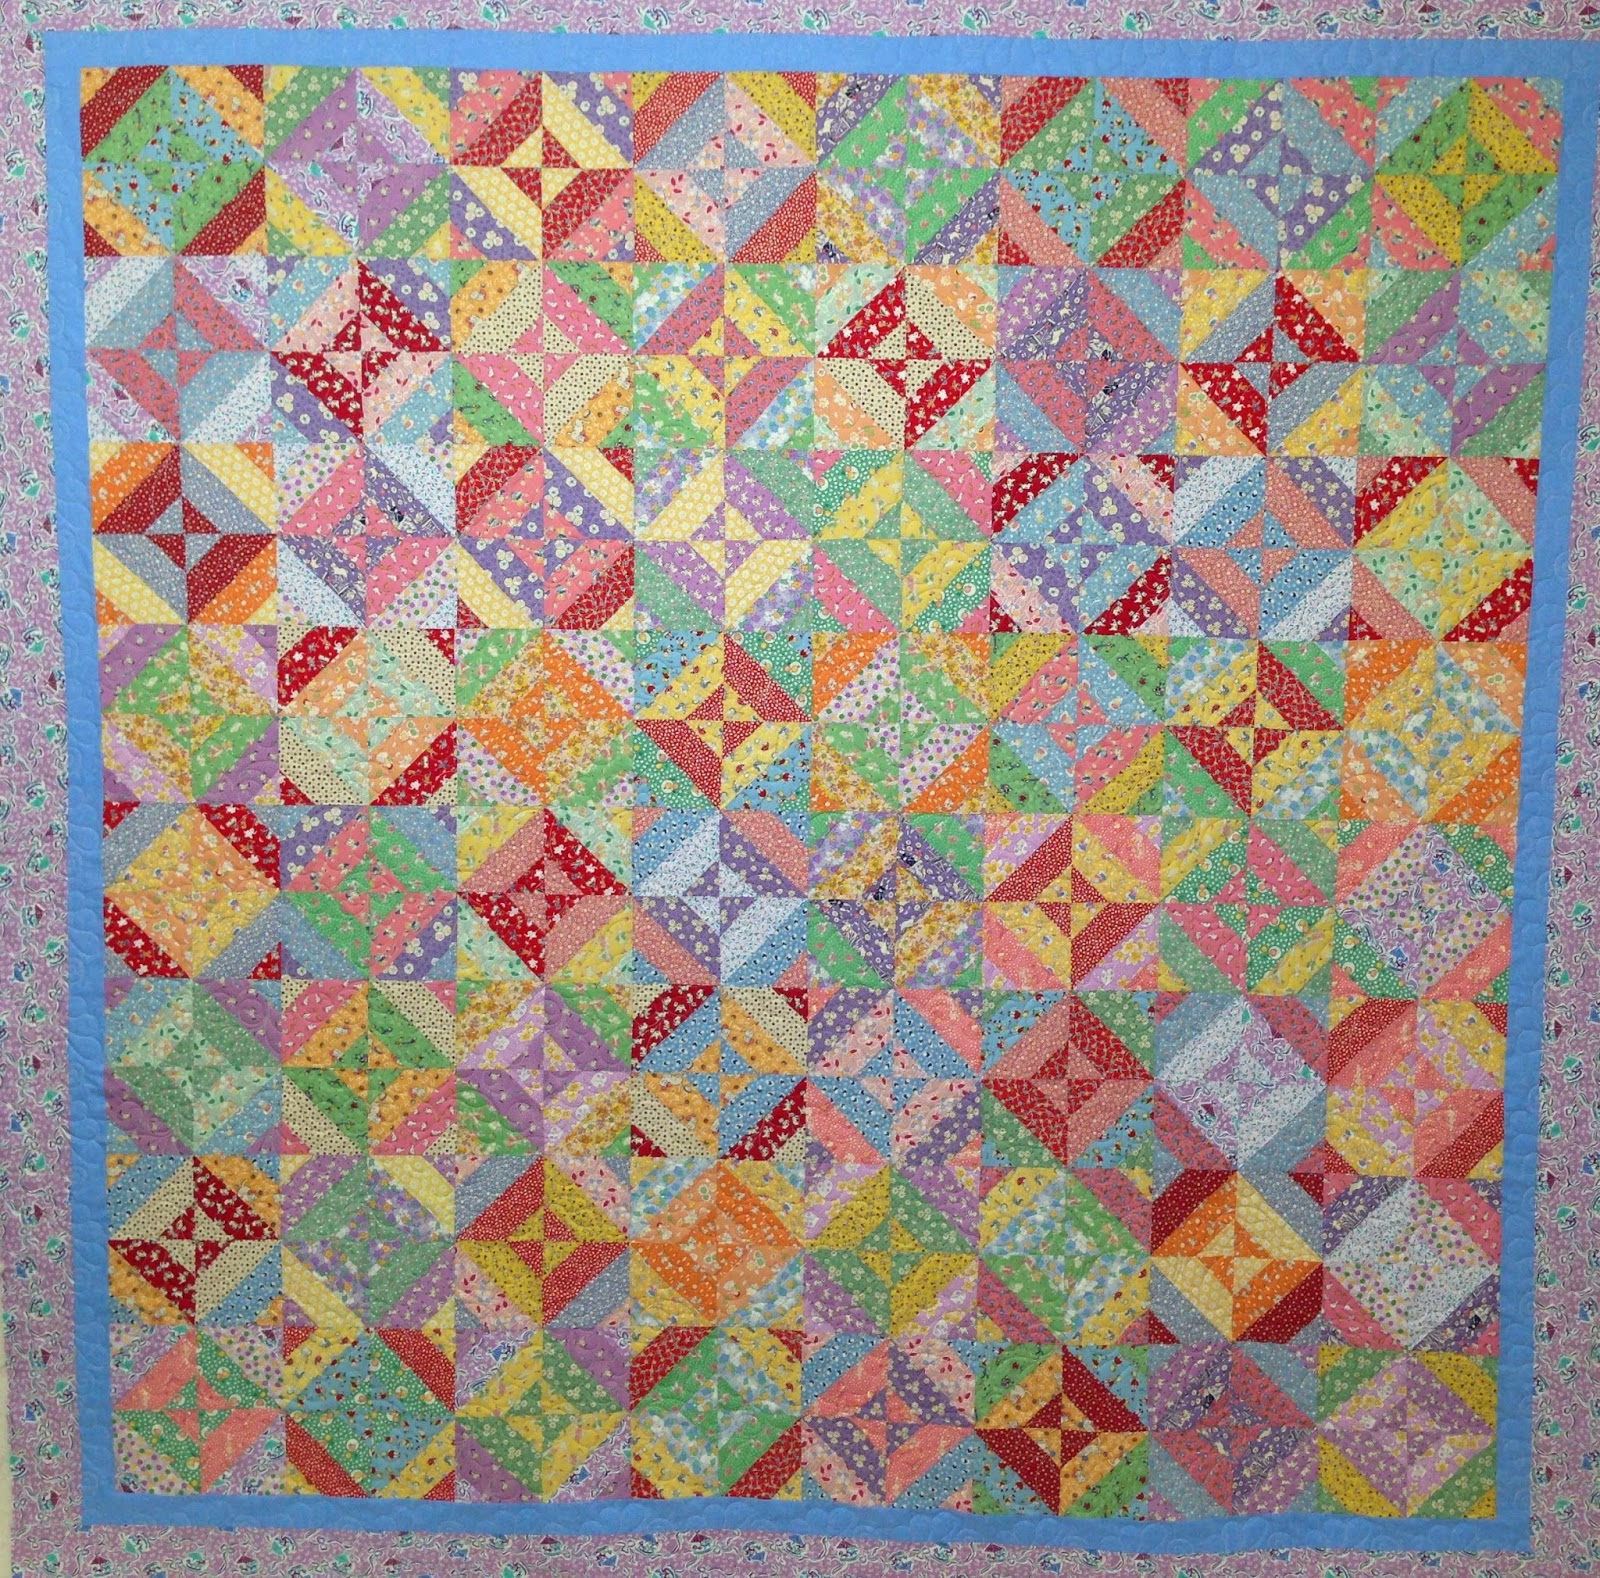 Lisa Boyette 1930's Reproduction Quilt